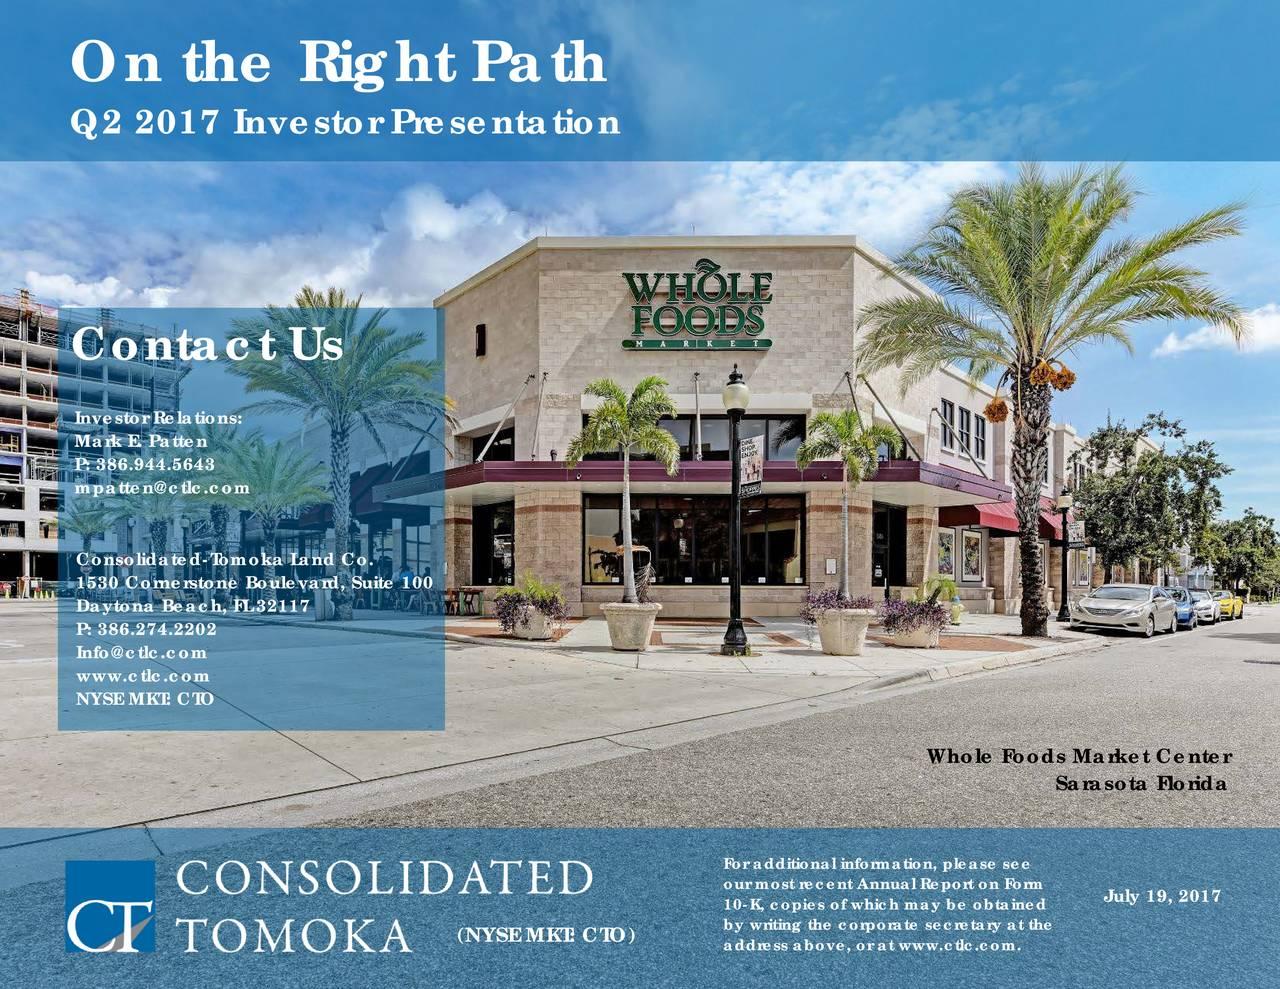 Cornerstone Boulevard Suite  Daytona Beach Fl